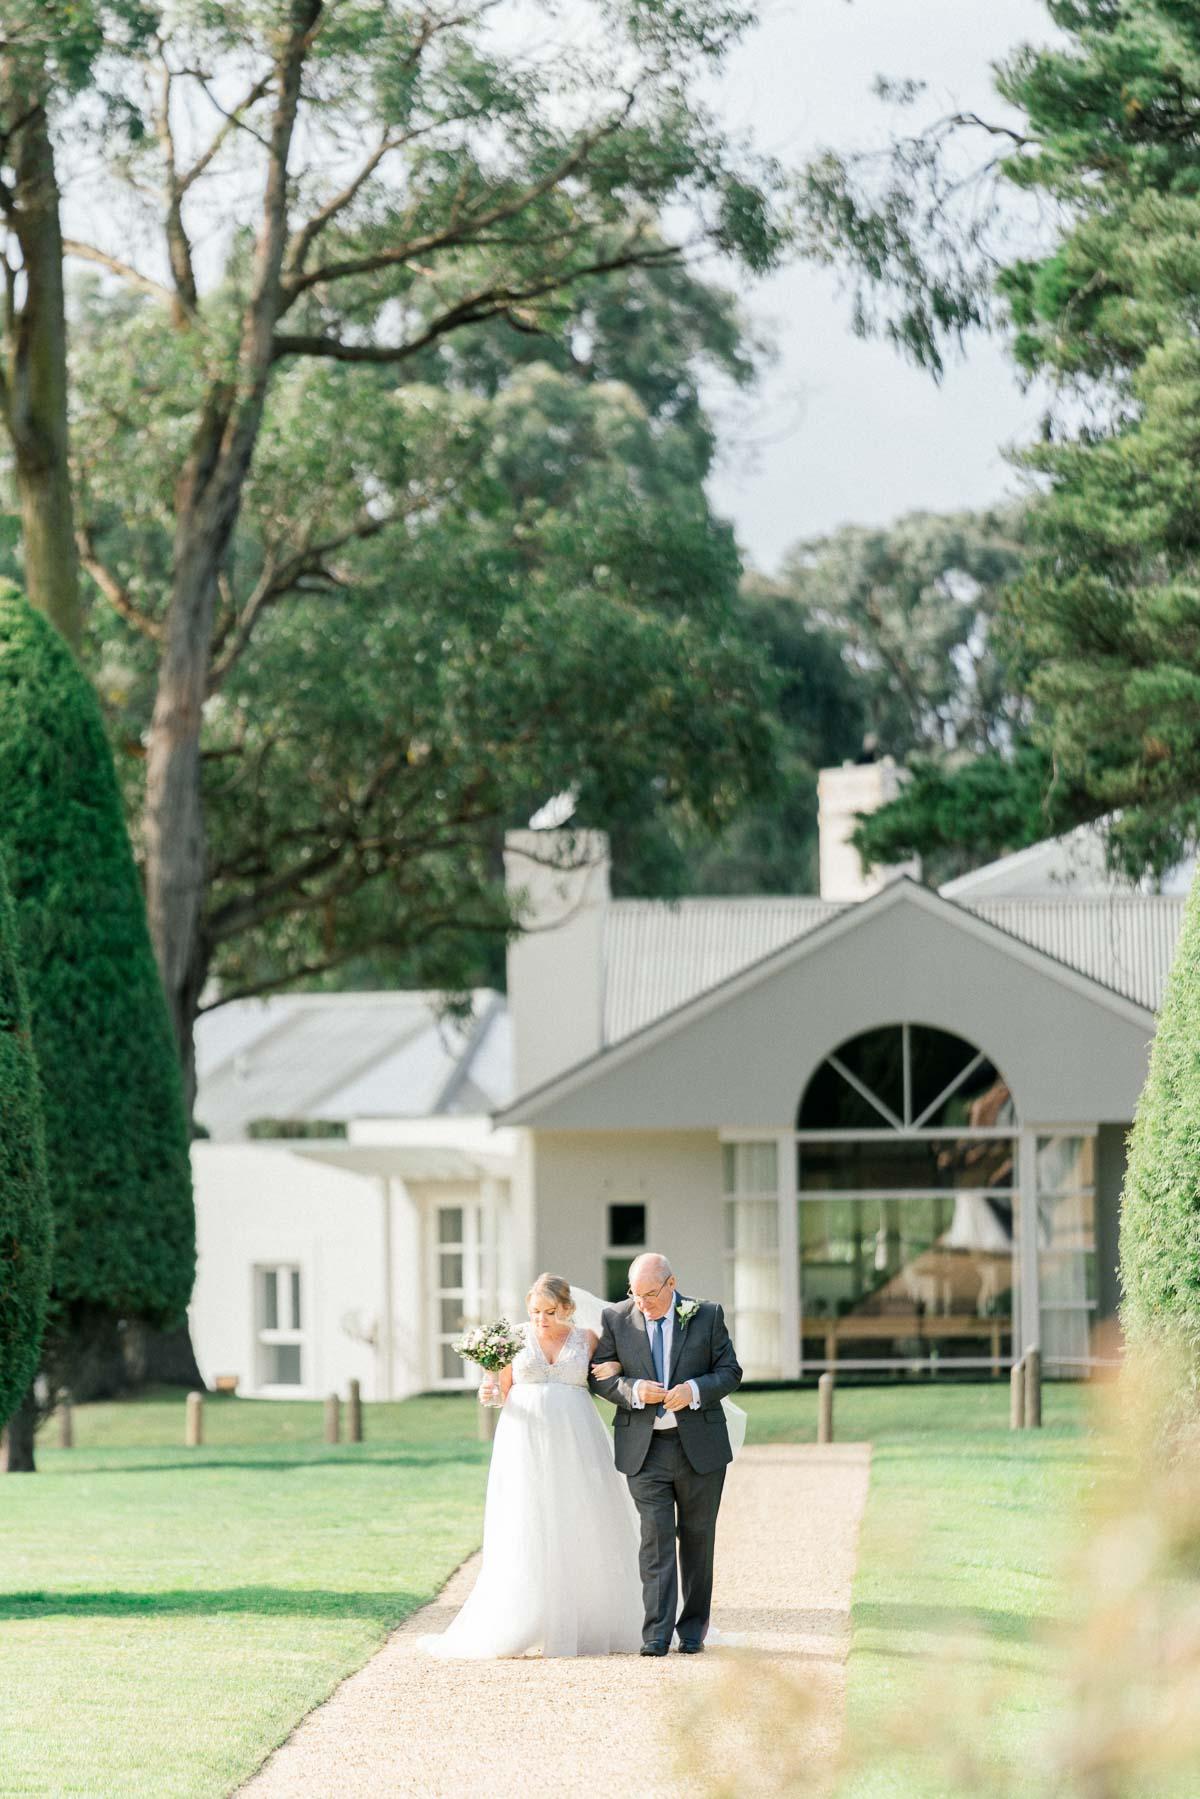 lindenderry-wedding-heart+soul-weddings-amy-alain-03189.jpg